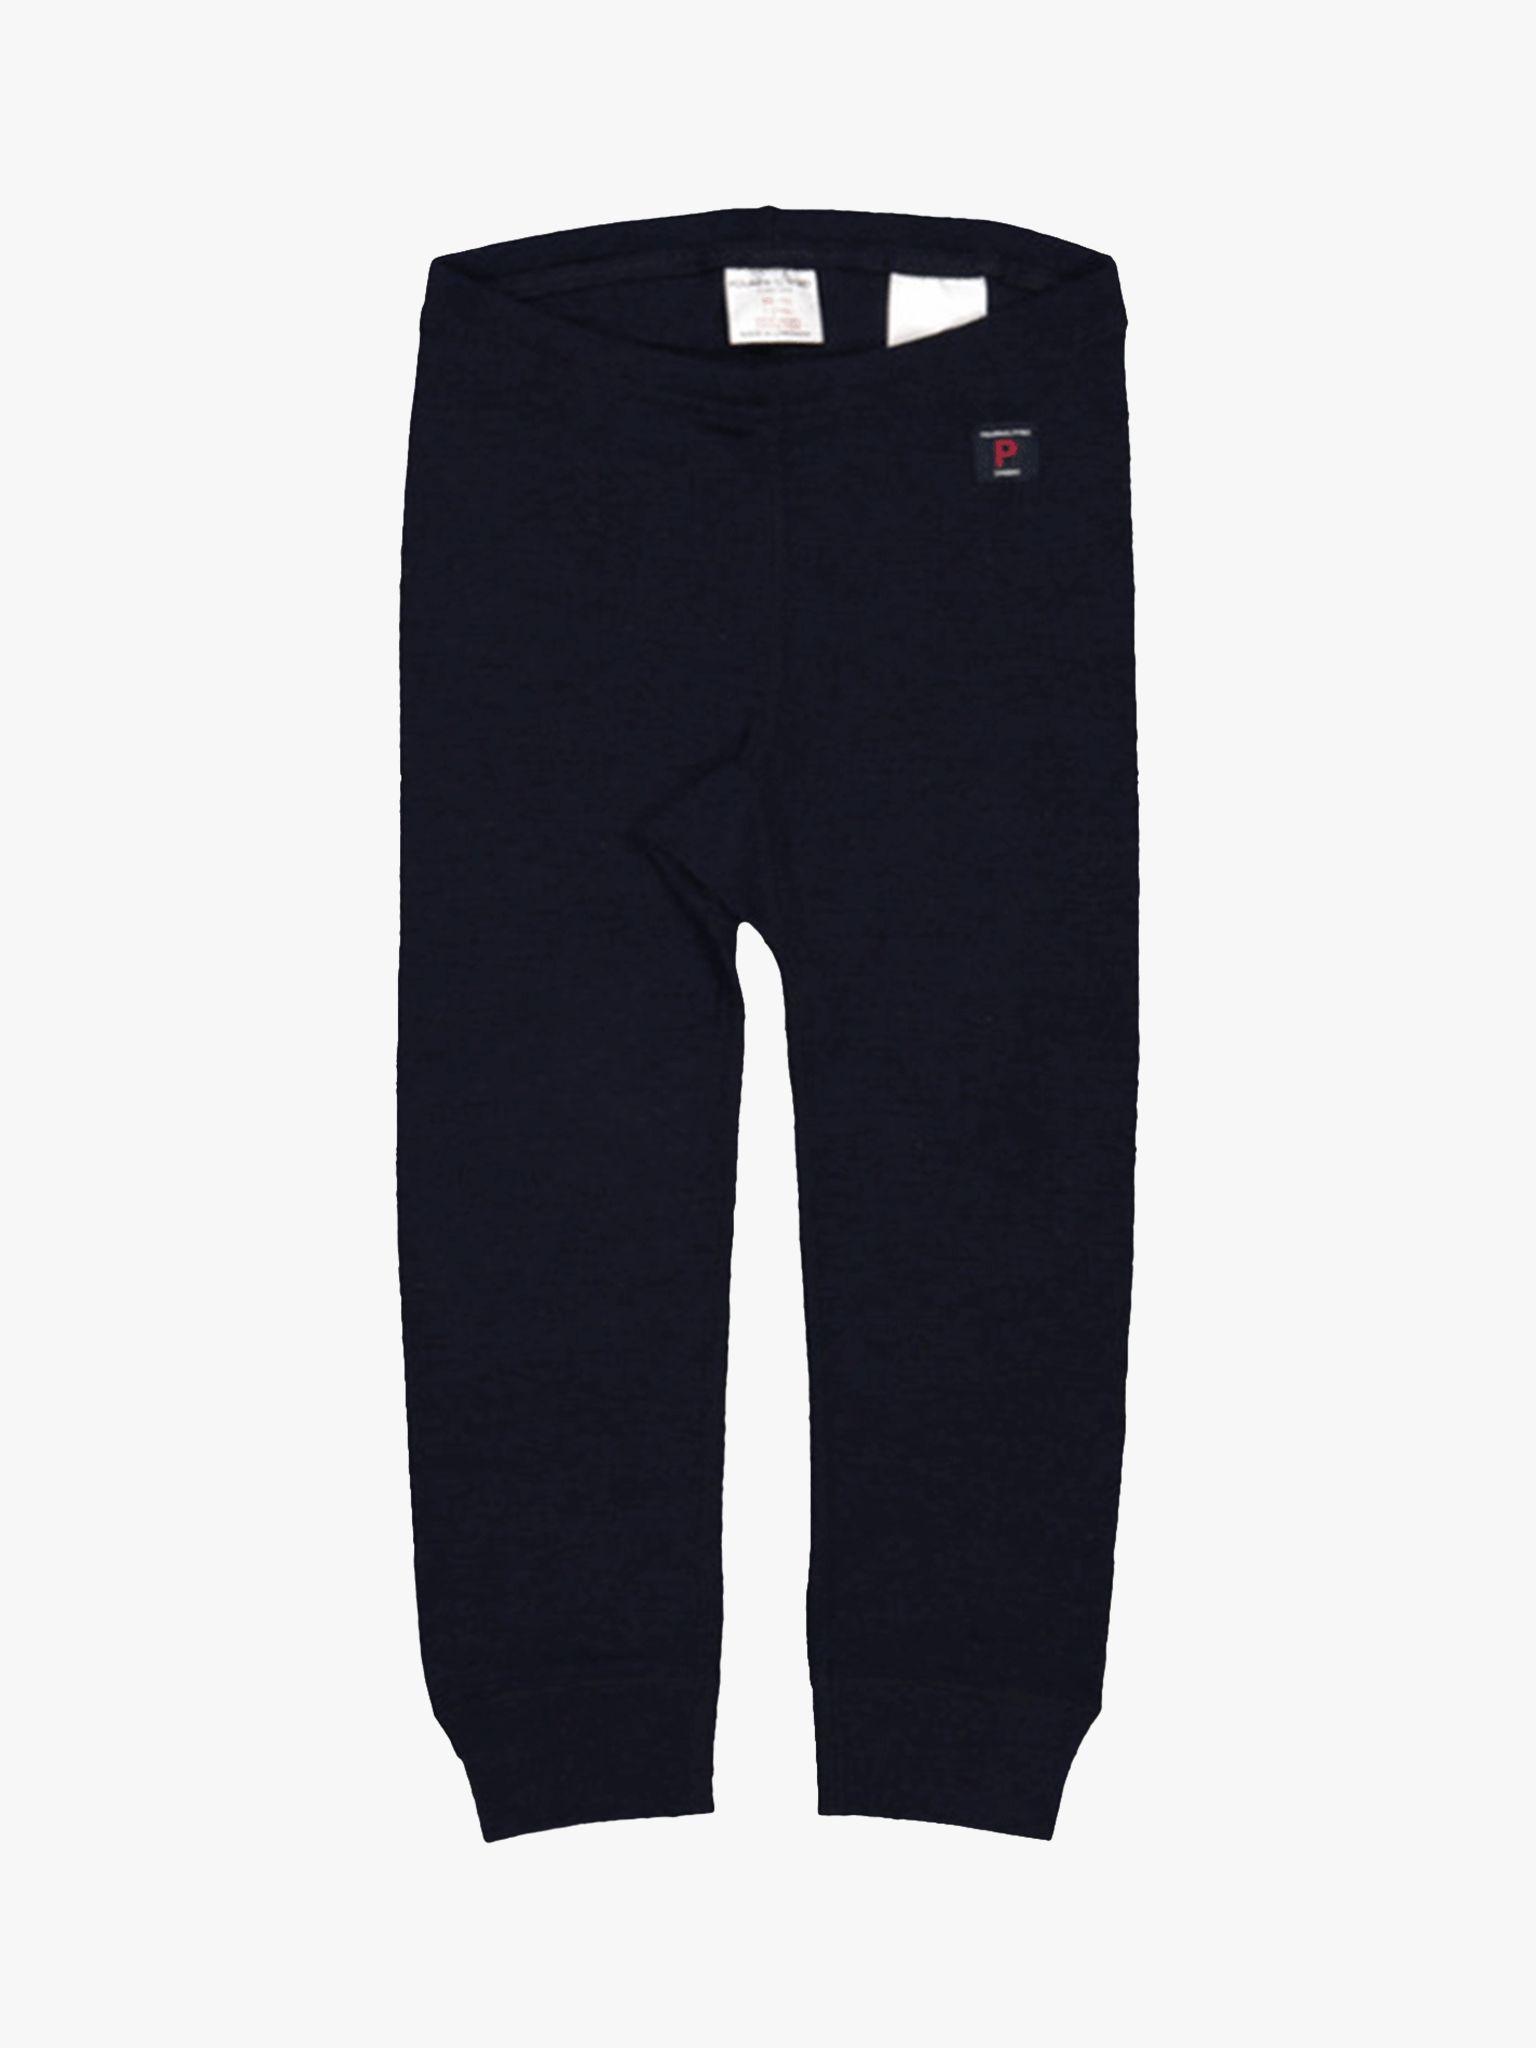 Polarn O. Pyret Polarn O. Pyret Children's Merino Wool Long Johns, Dark Sapphire